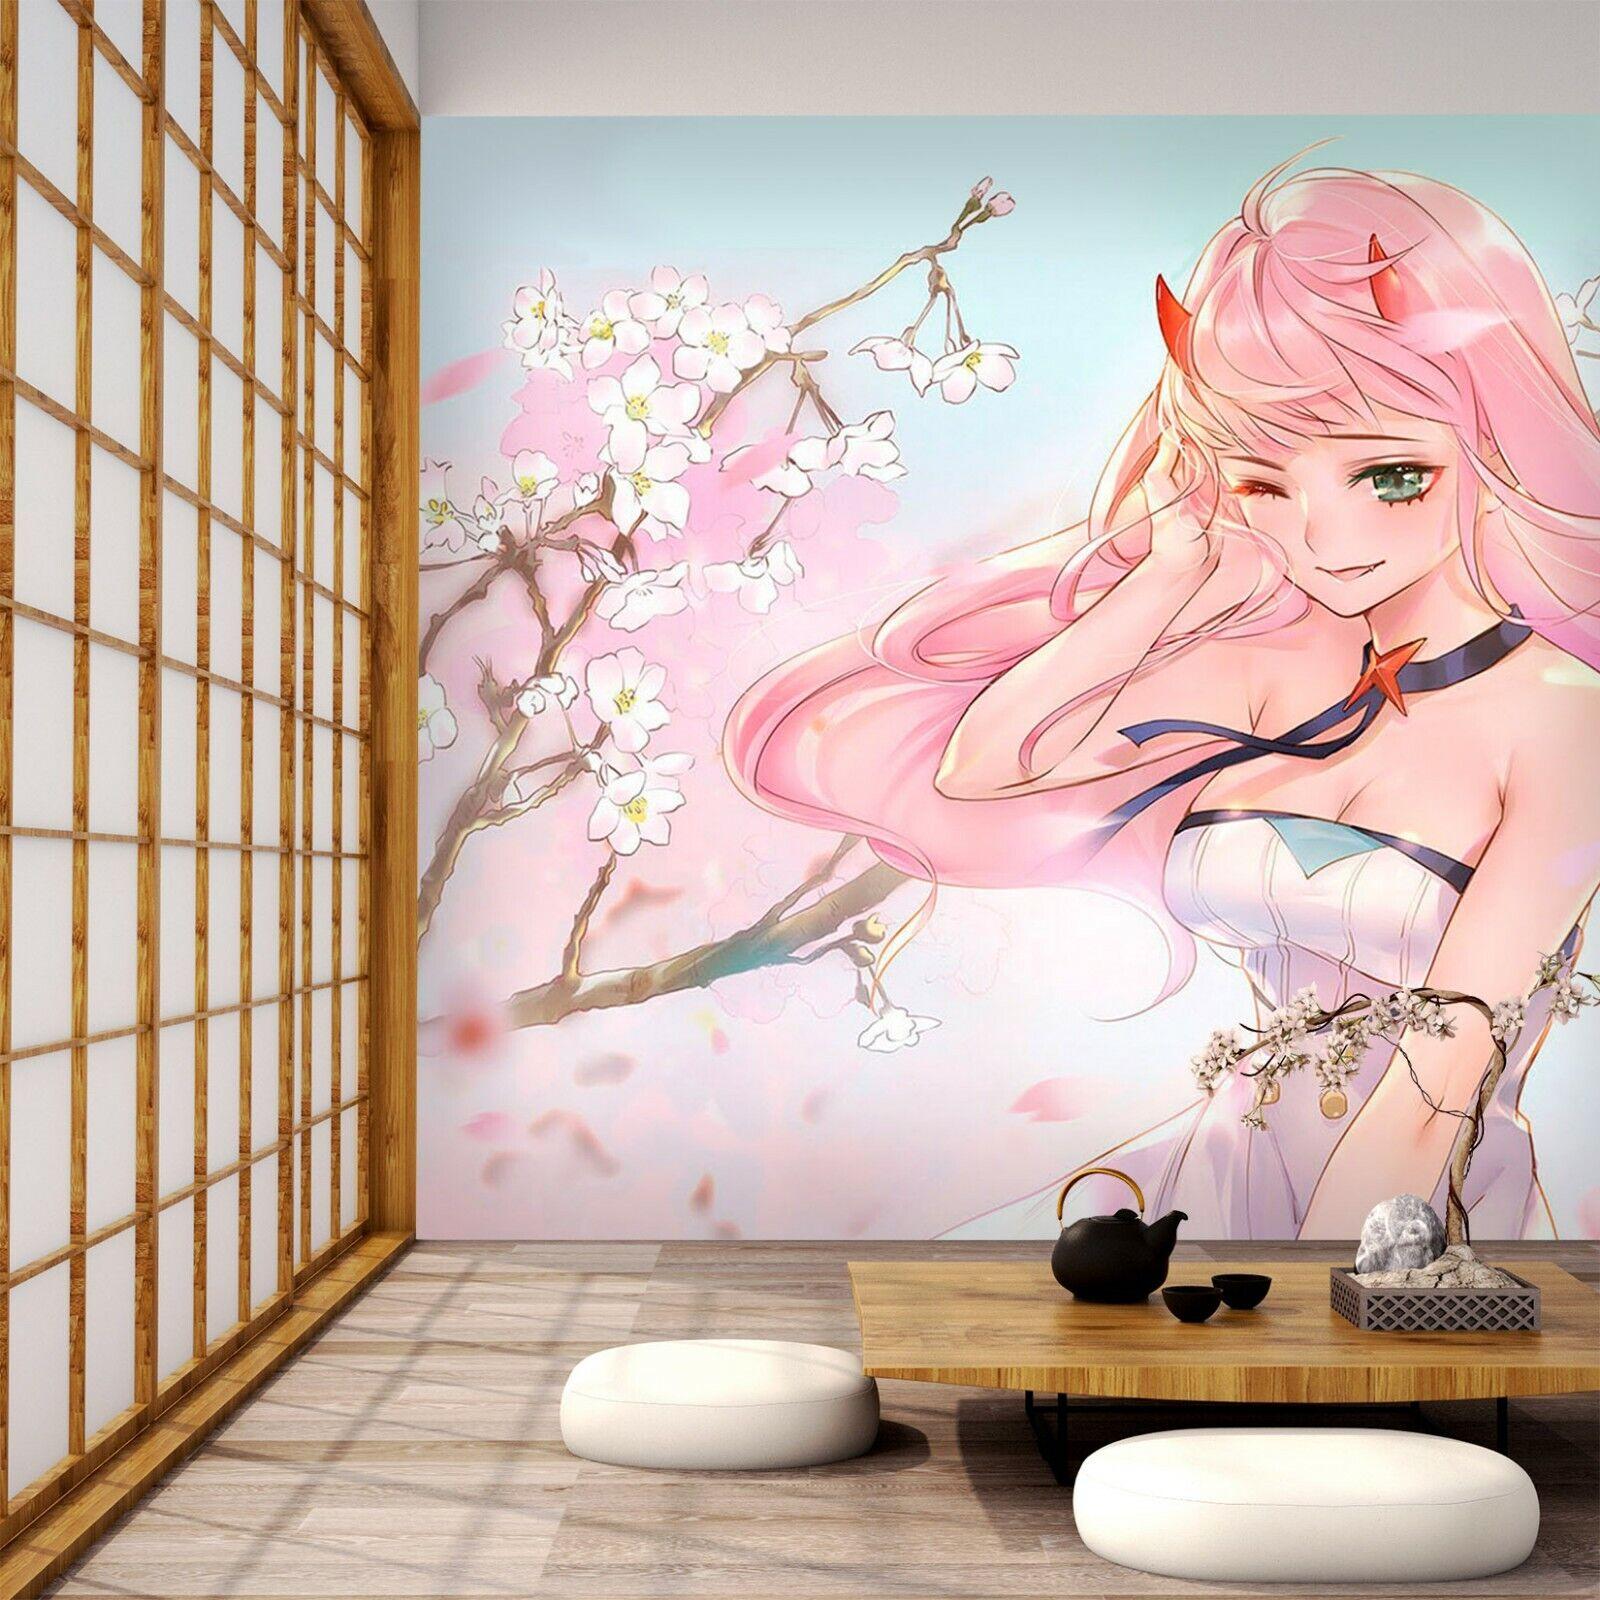 3D DARLING In The FRANXX H27 Japan Anime Tapete Wandgemälde Karikatur Wand Acmy